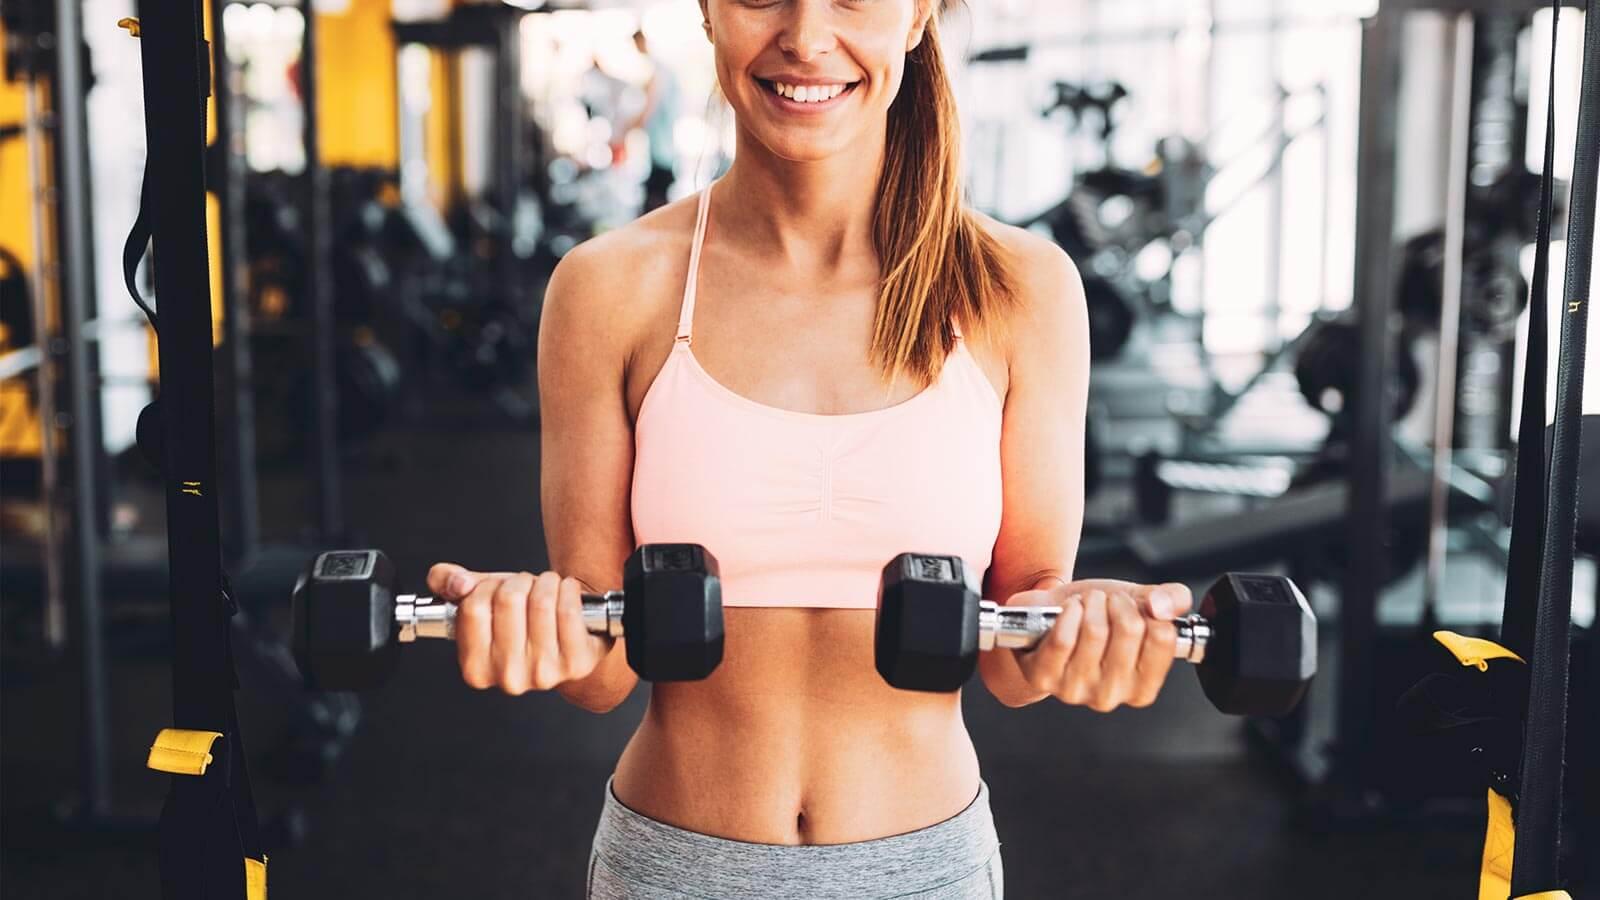 perte de poids de gohana type de corps surrénalien et perte de poids